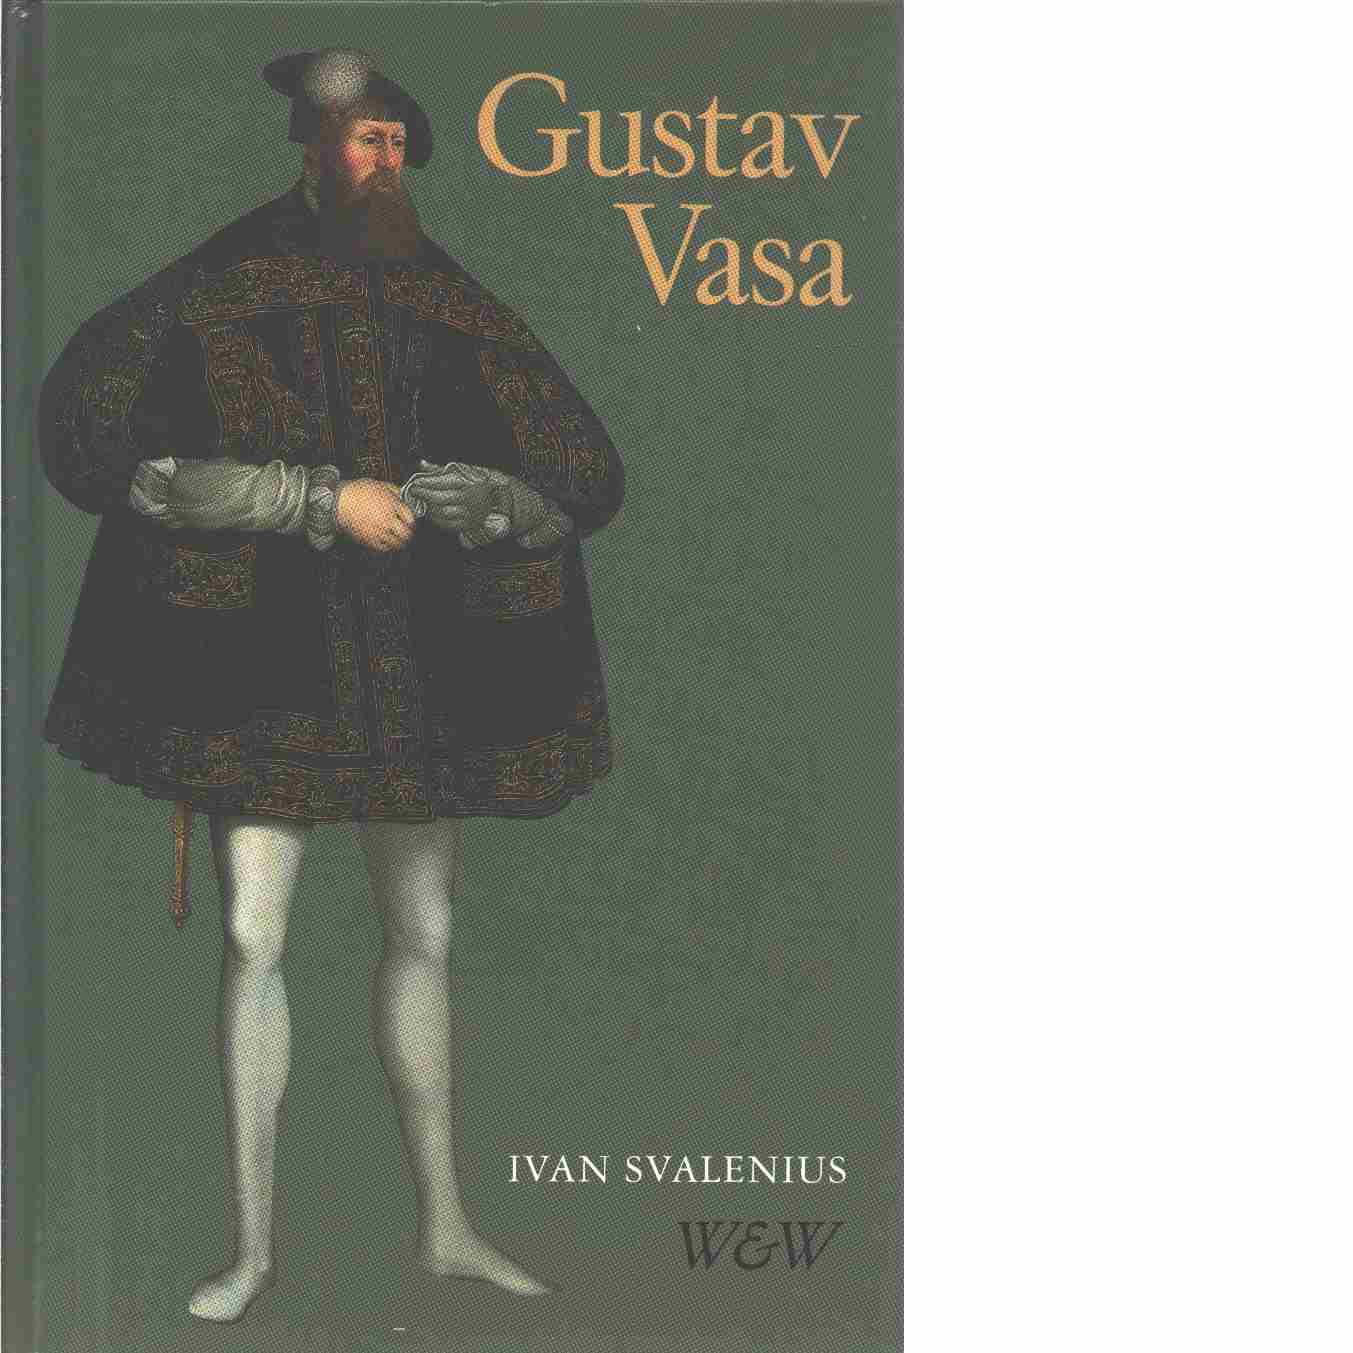 Gustav Vasa -  Svalenius, Ivan